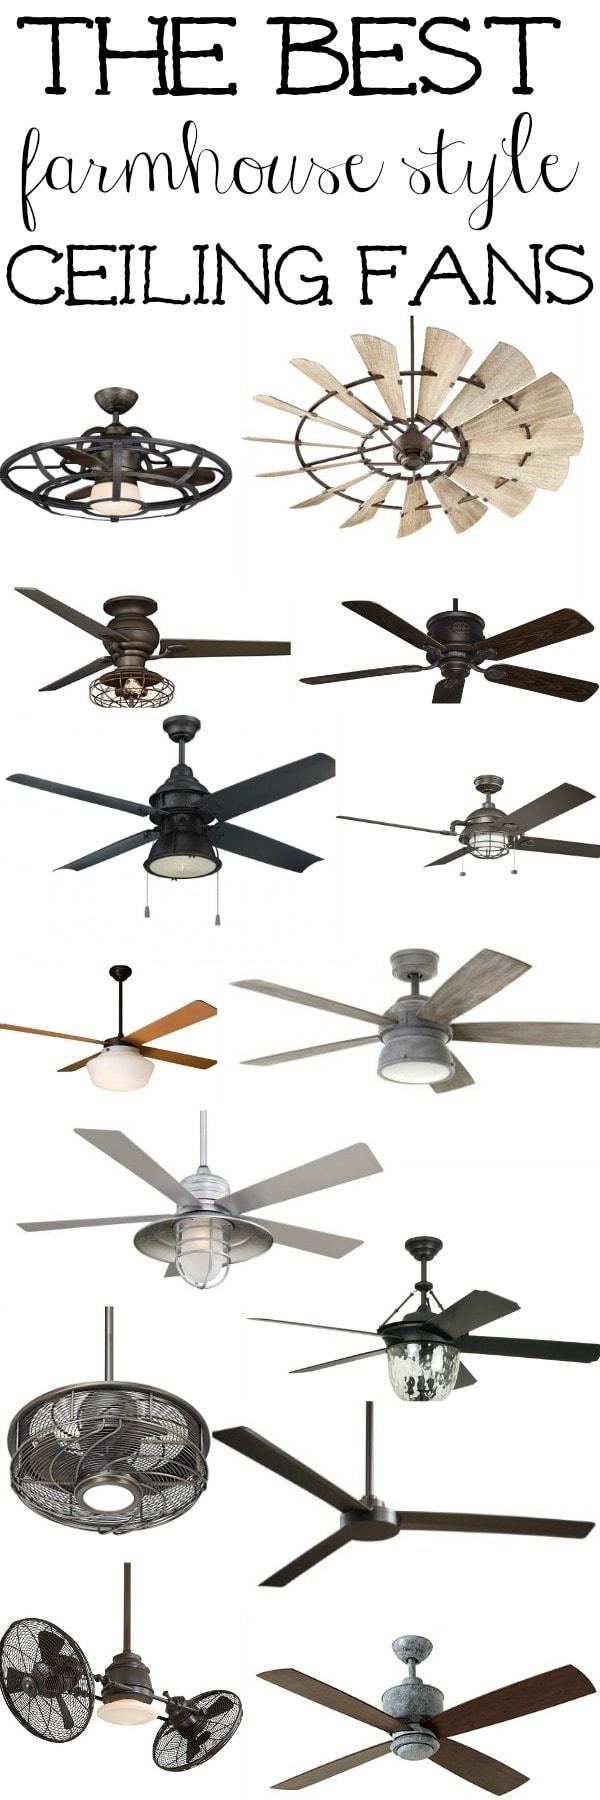 the best farmhouse ceiling fans liz marie blog rh lizmarieblog com